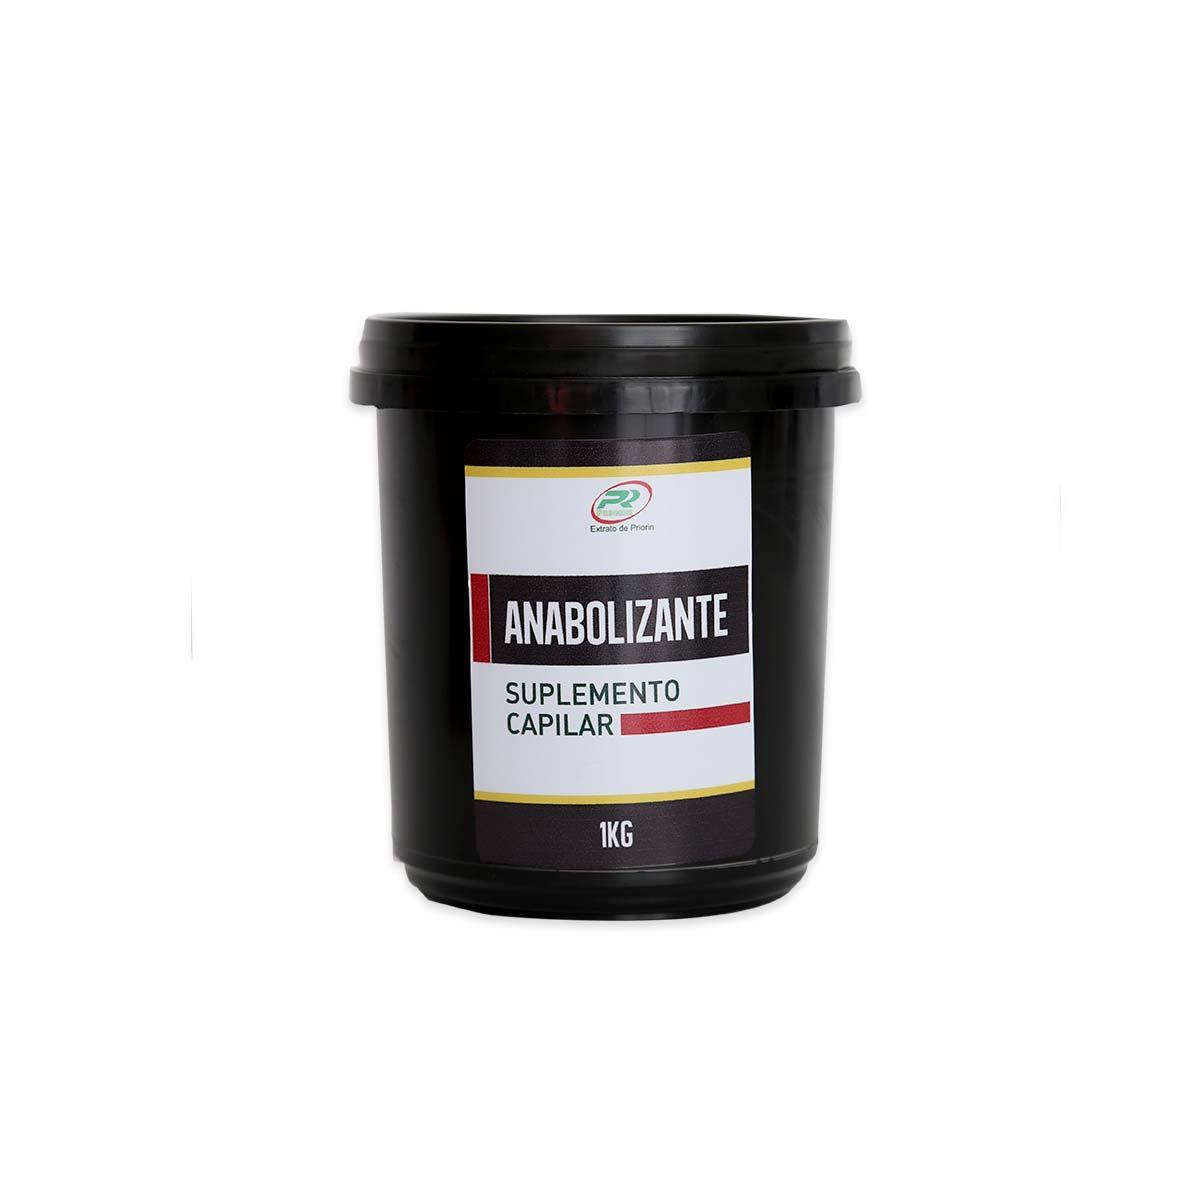 Anabolizante Capilar Extrato de Priorin - 1 KG